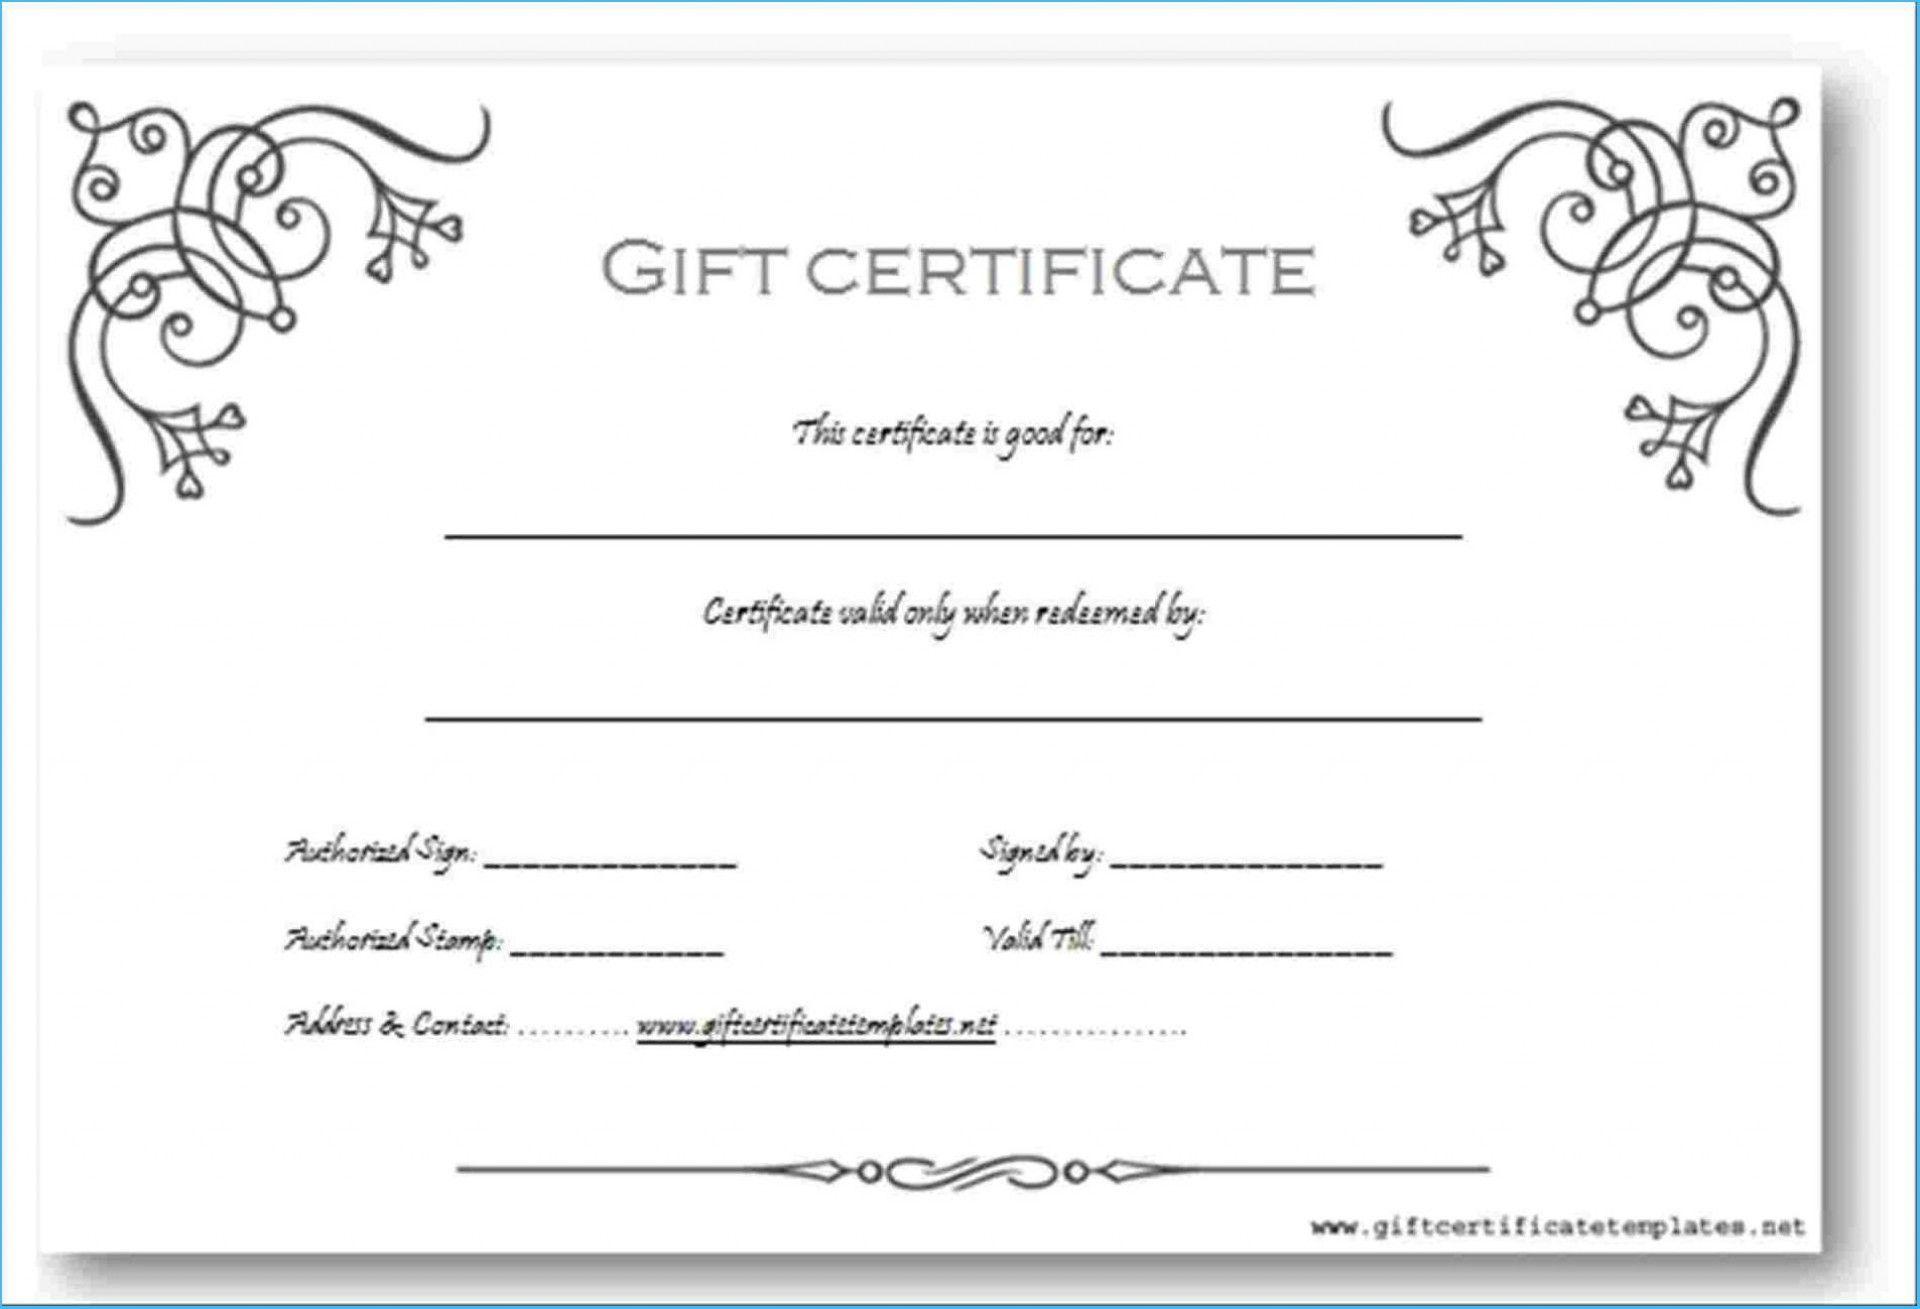 020 Template Ideas Printable Certificate Templates For Word Gift Certificate Template Word Free Gift Certificate Template Photography Gift Certificate Template